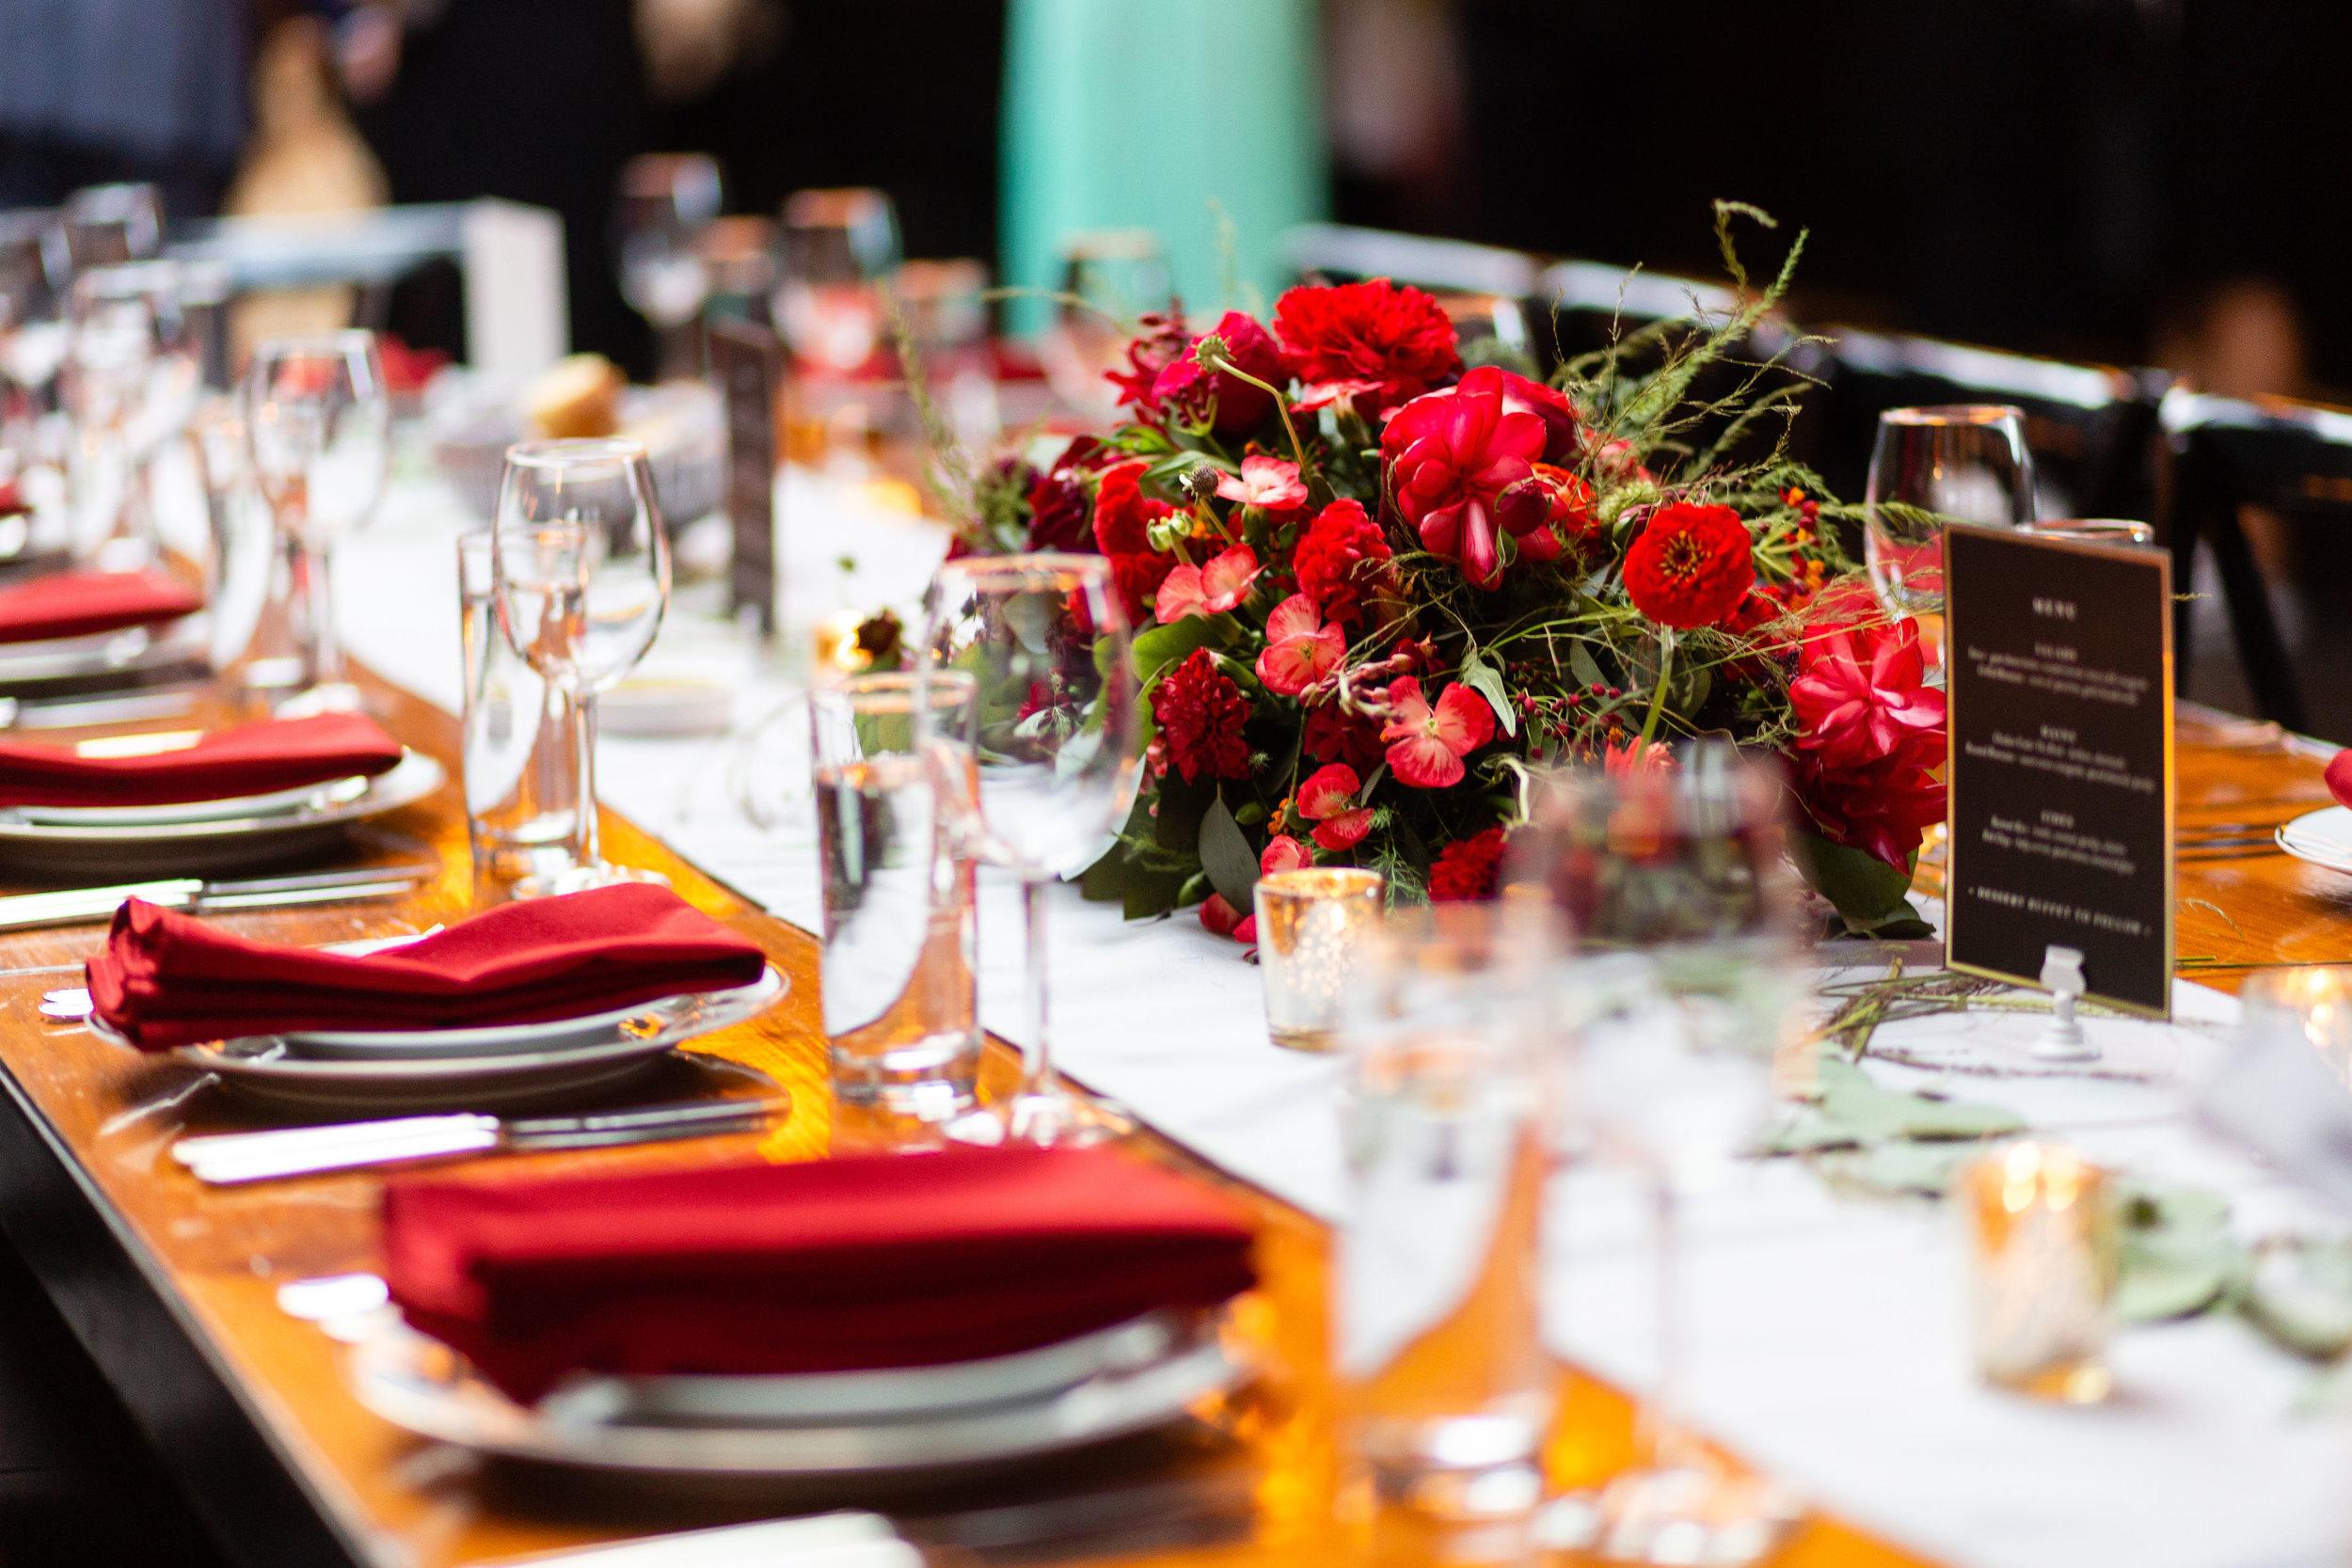 Elizabeth_Joab_multicultural_wedding_Petronella_Photography_747.jpg